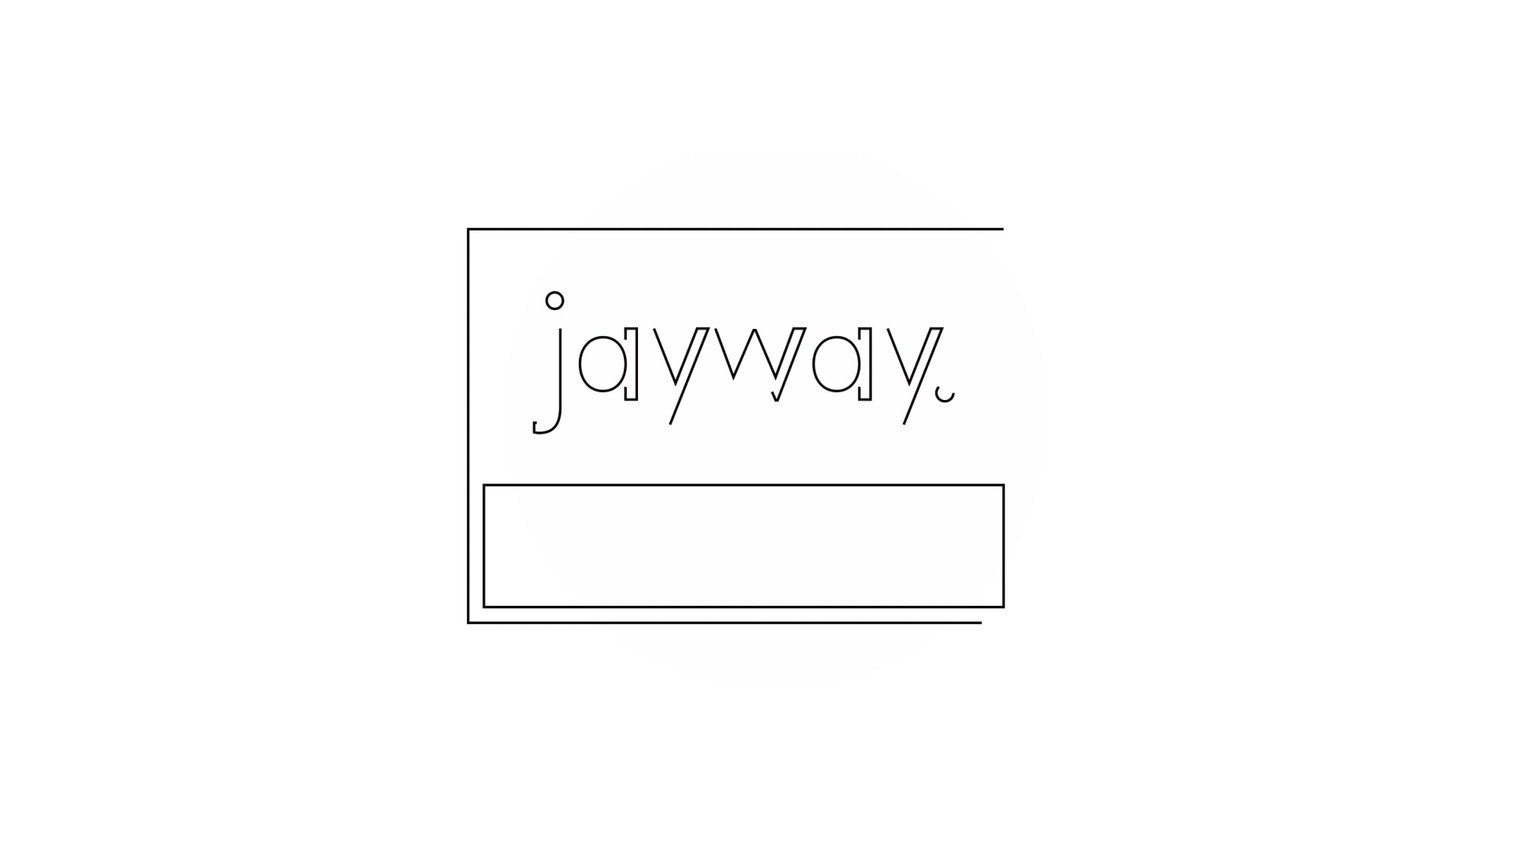 Jayway film_coloured version_shortened.m